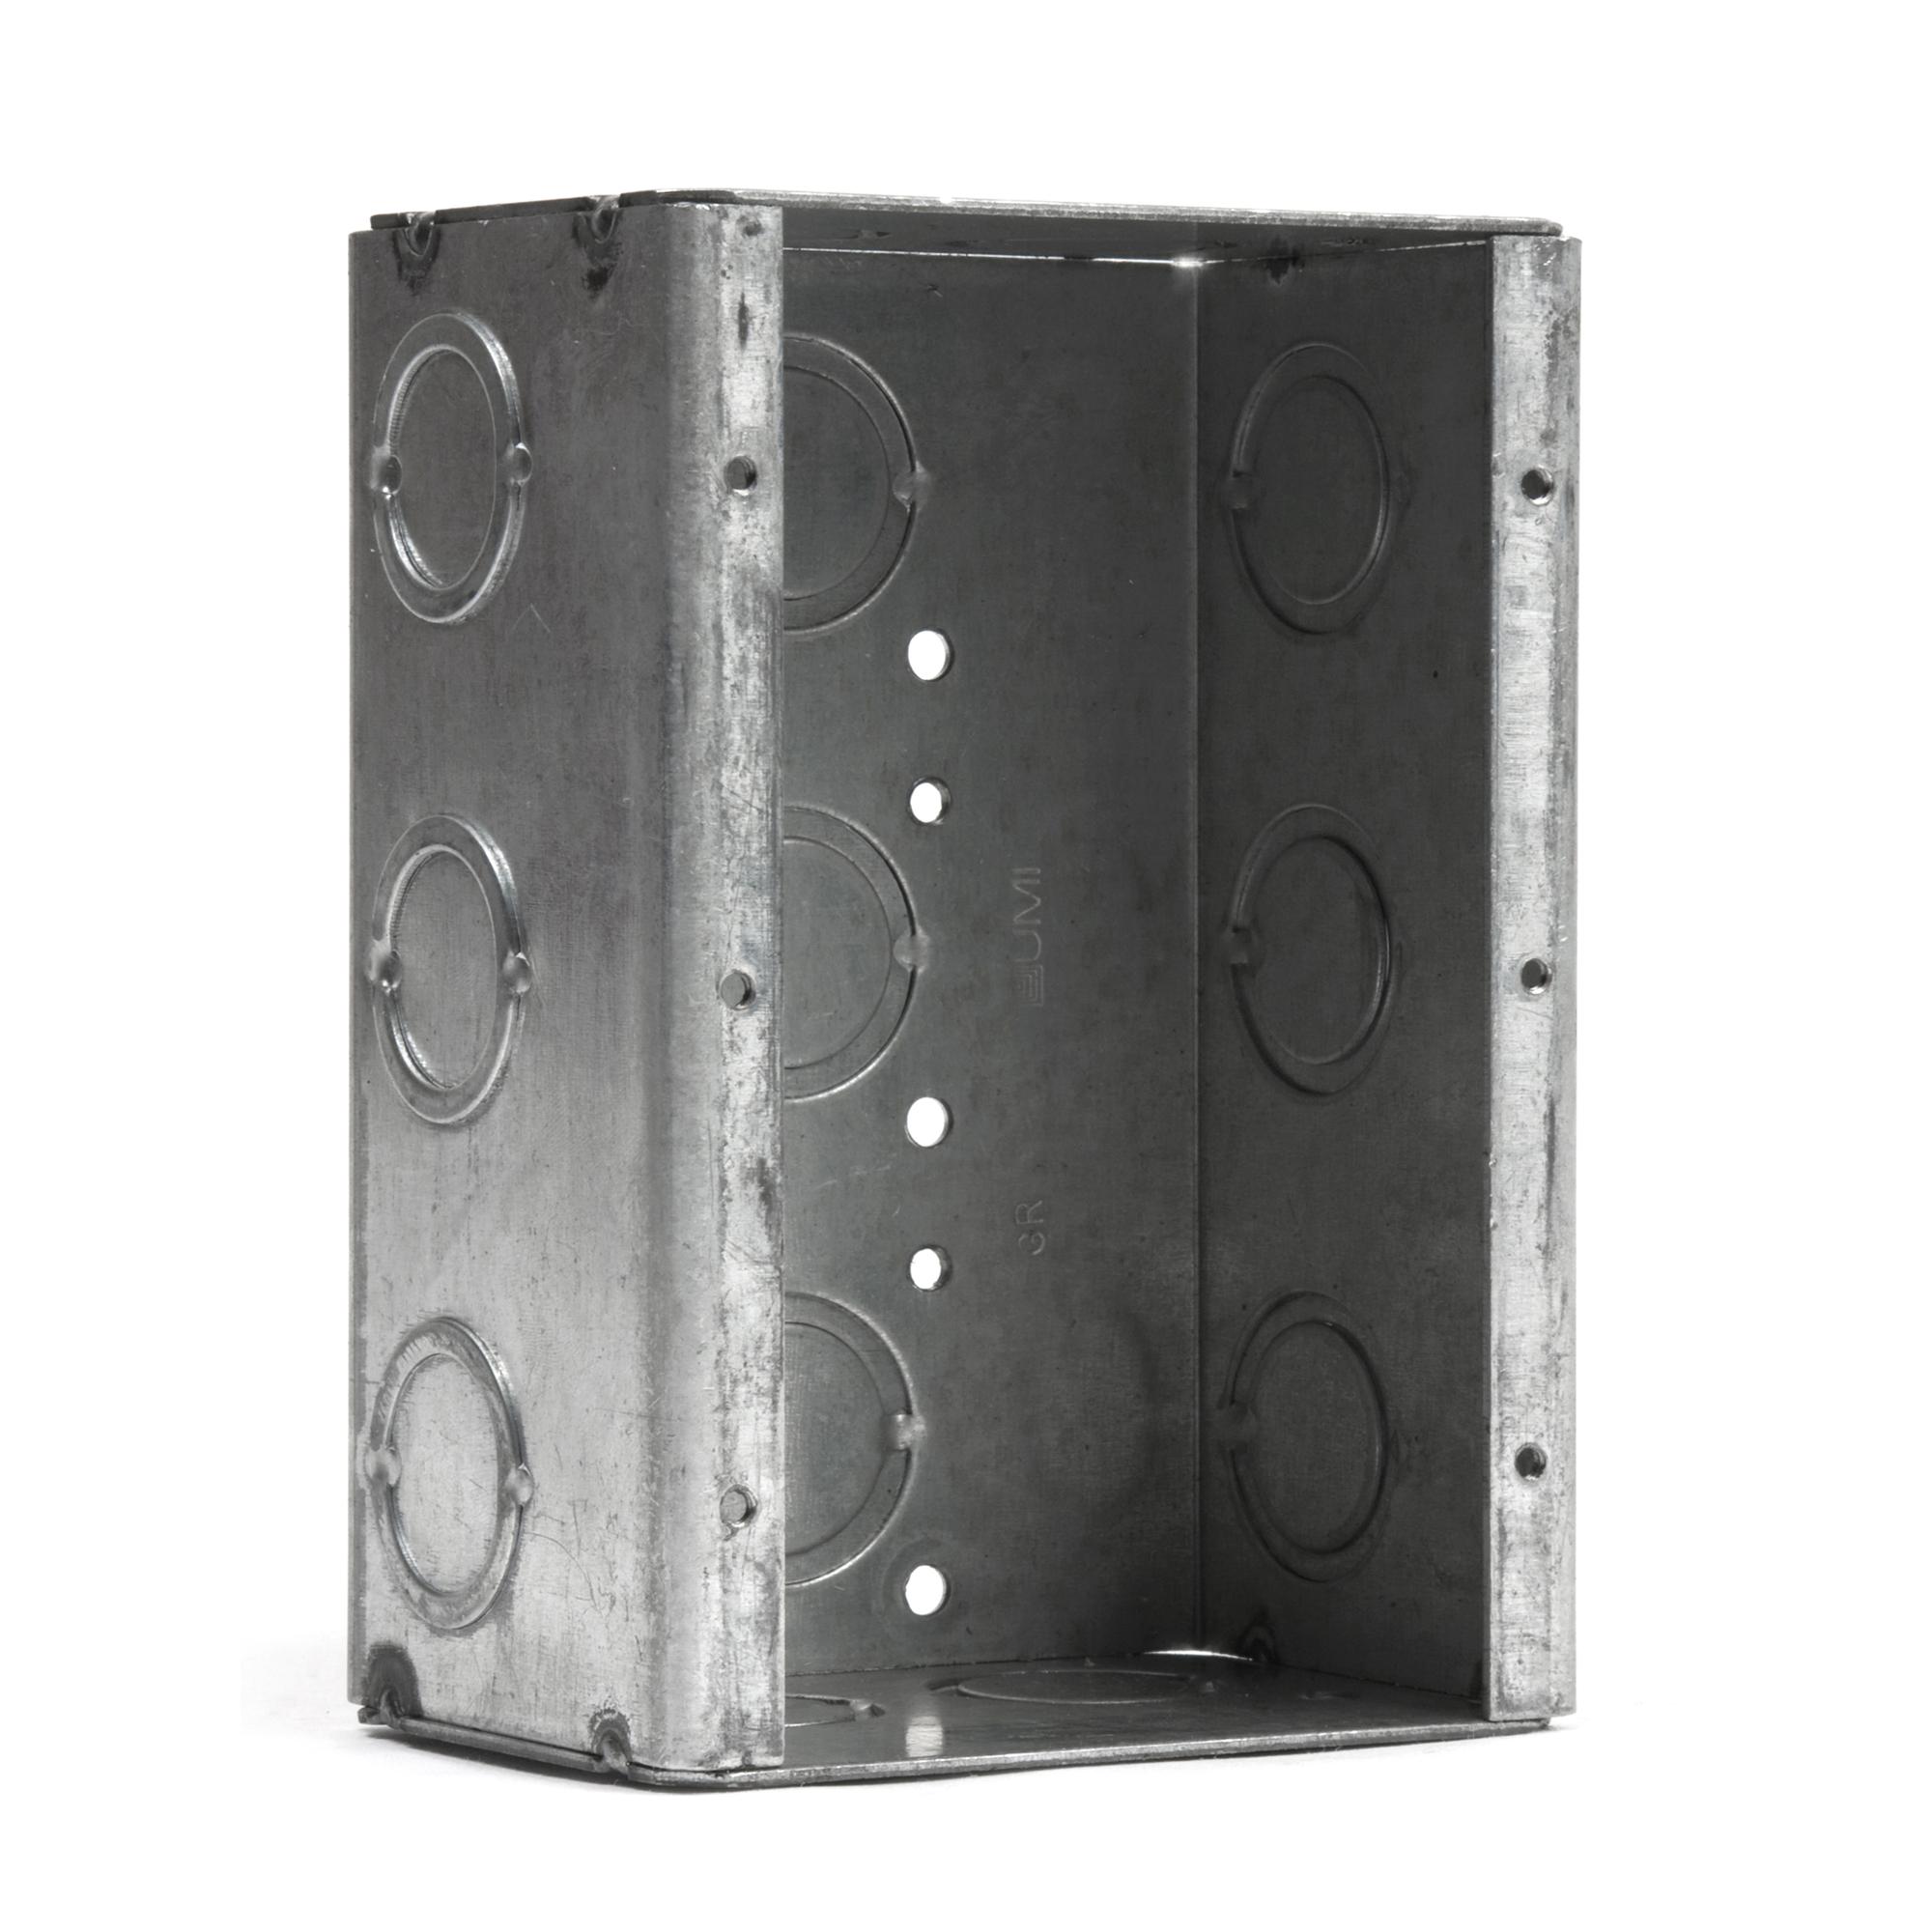 3 Gang Flush Mount back box